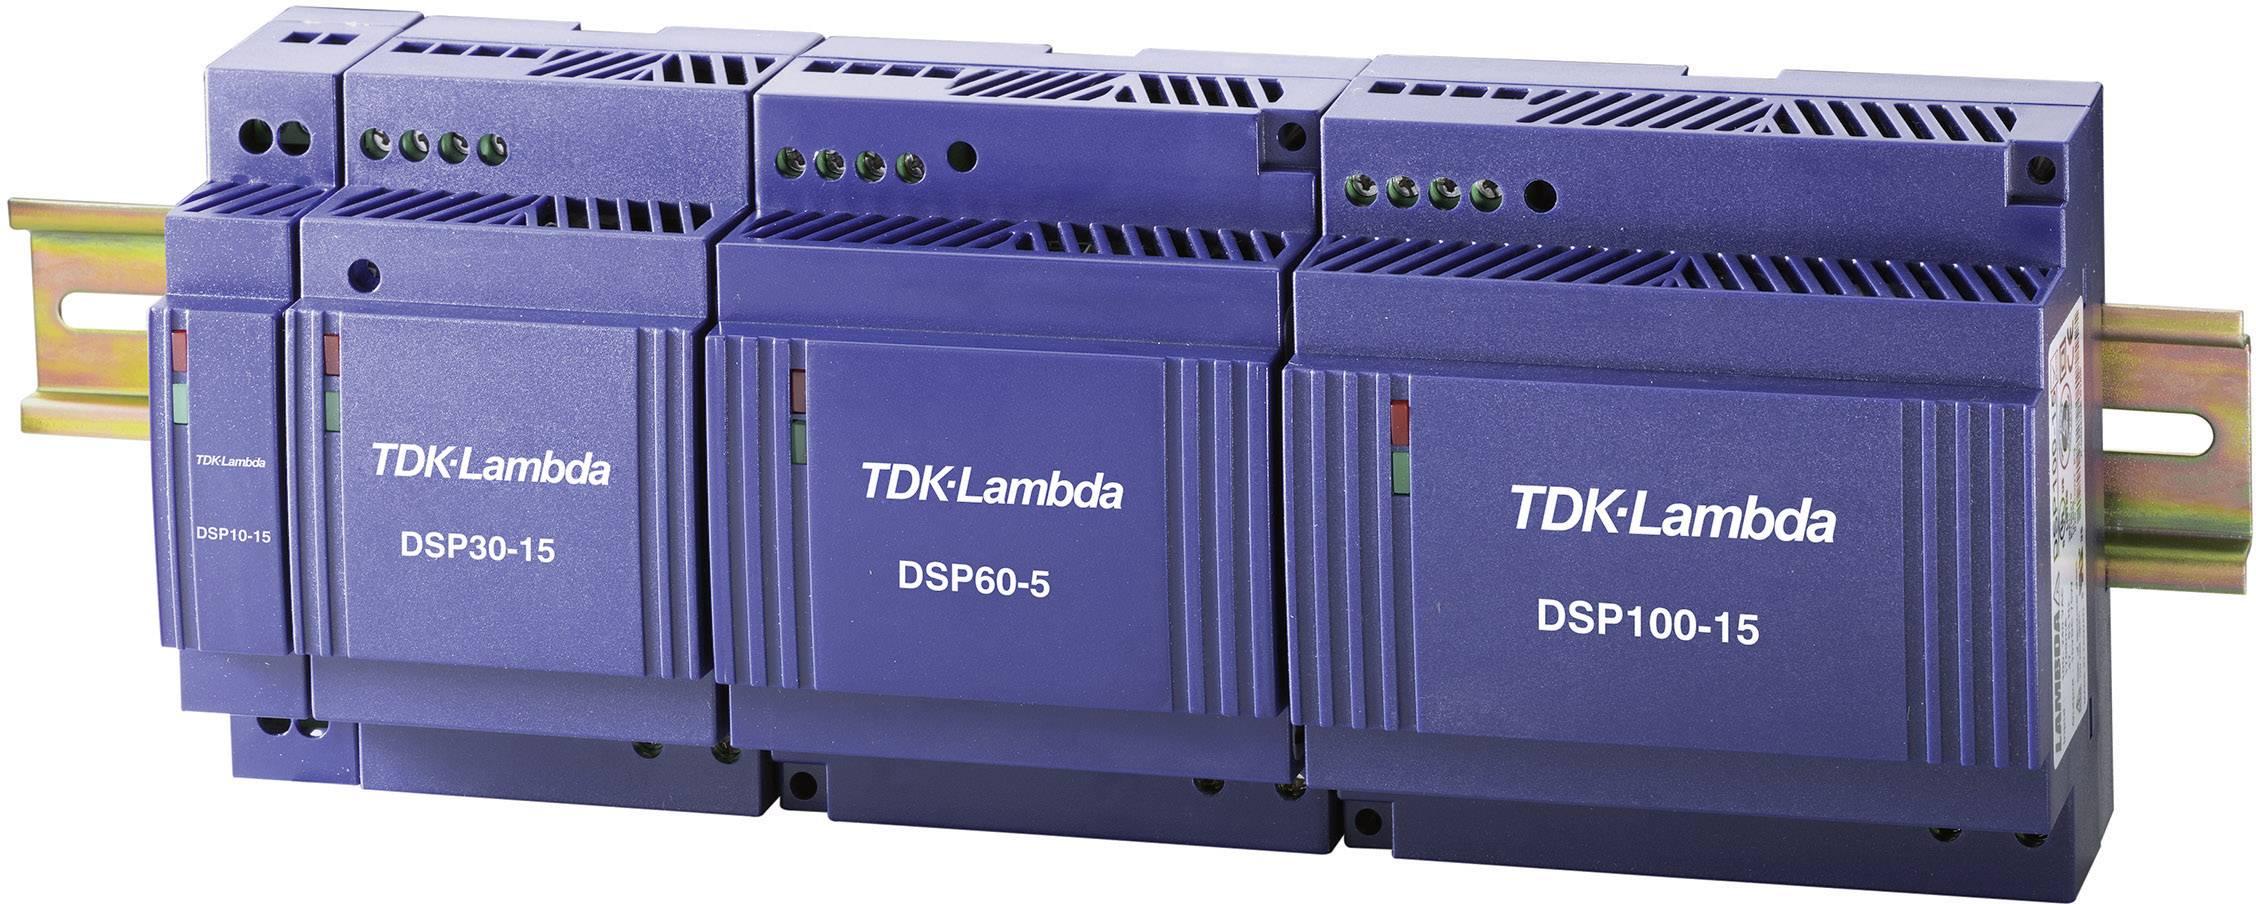 Sieťový zdroj na montážnu lištu (DIN lištu) TDK-Lambda DSP-60-12, 1 x, 12 V/DC, 4.5 A, 54 W